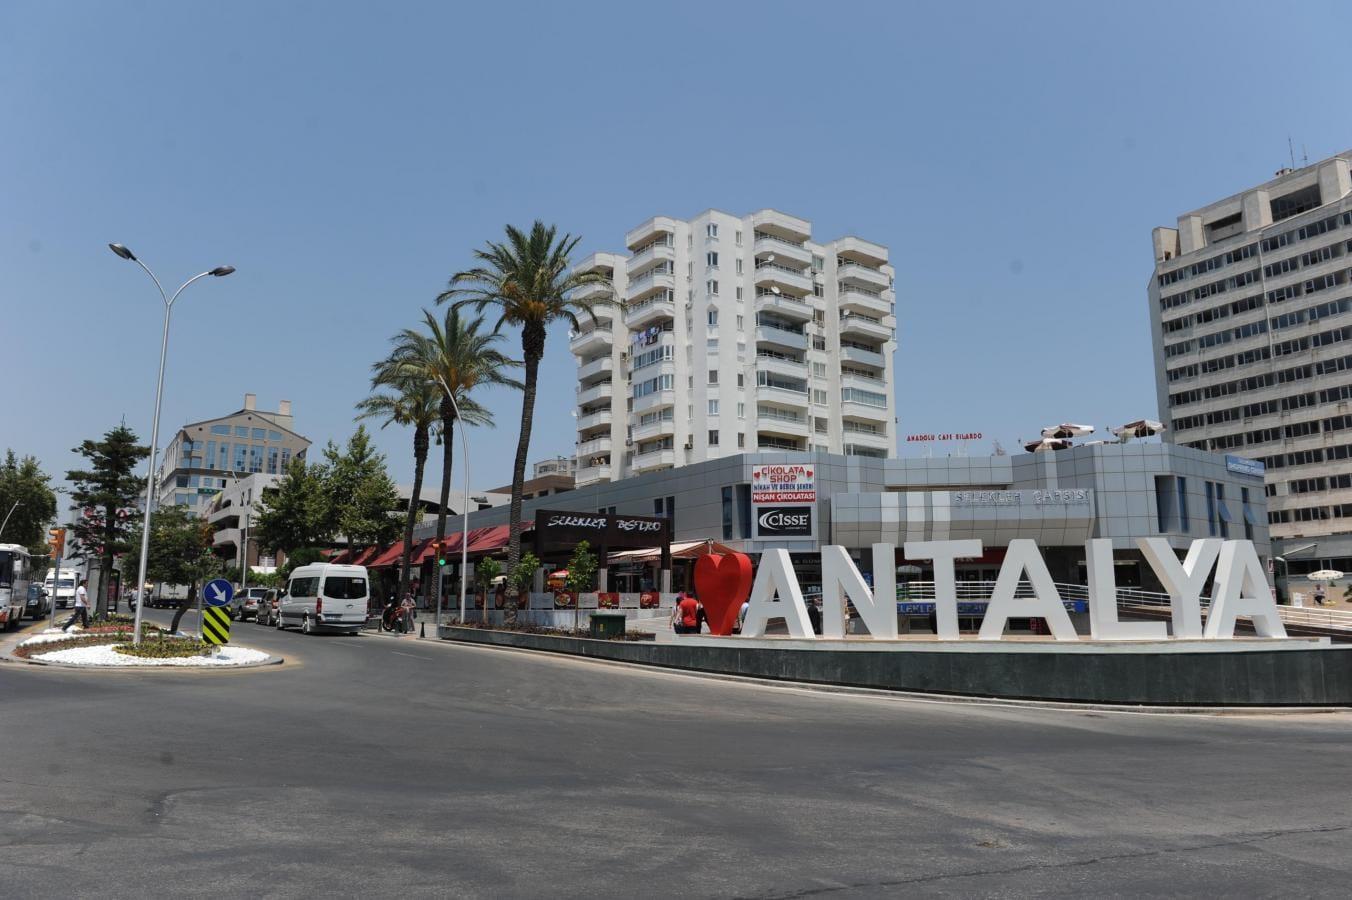 Antalya Şehir Turu Tour